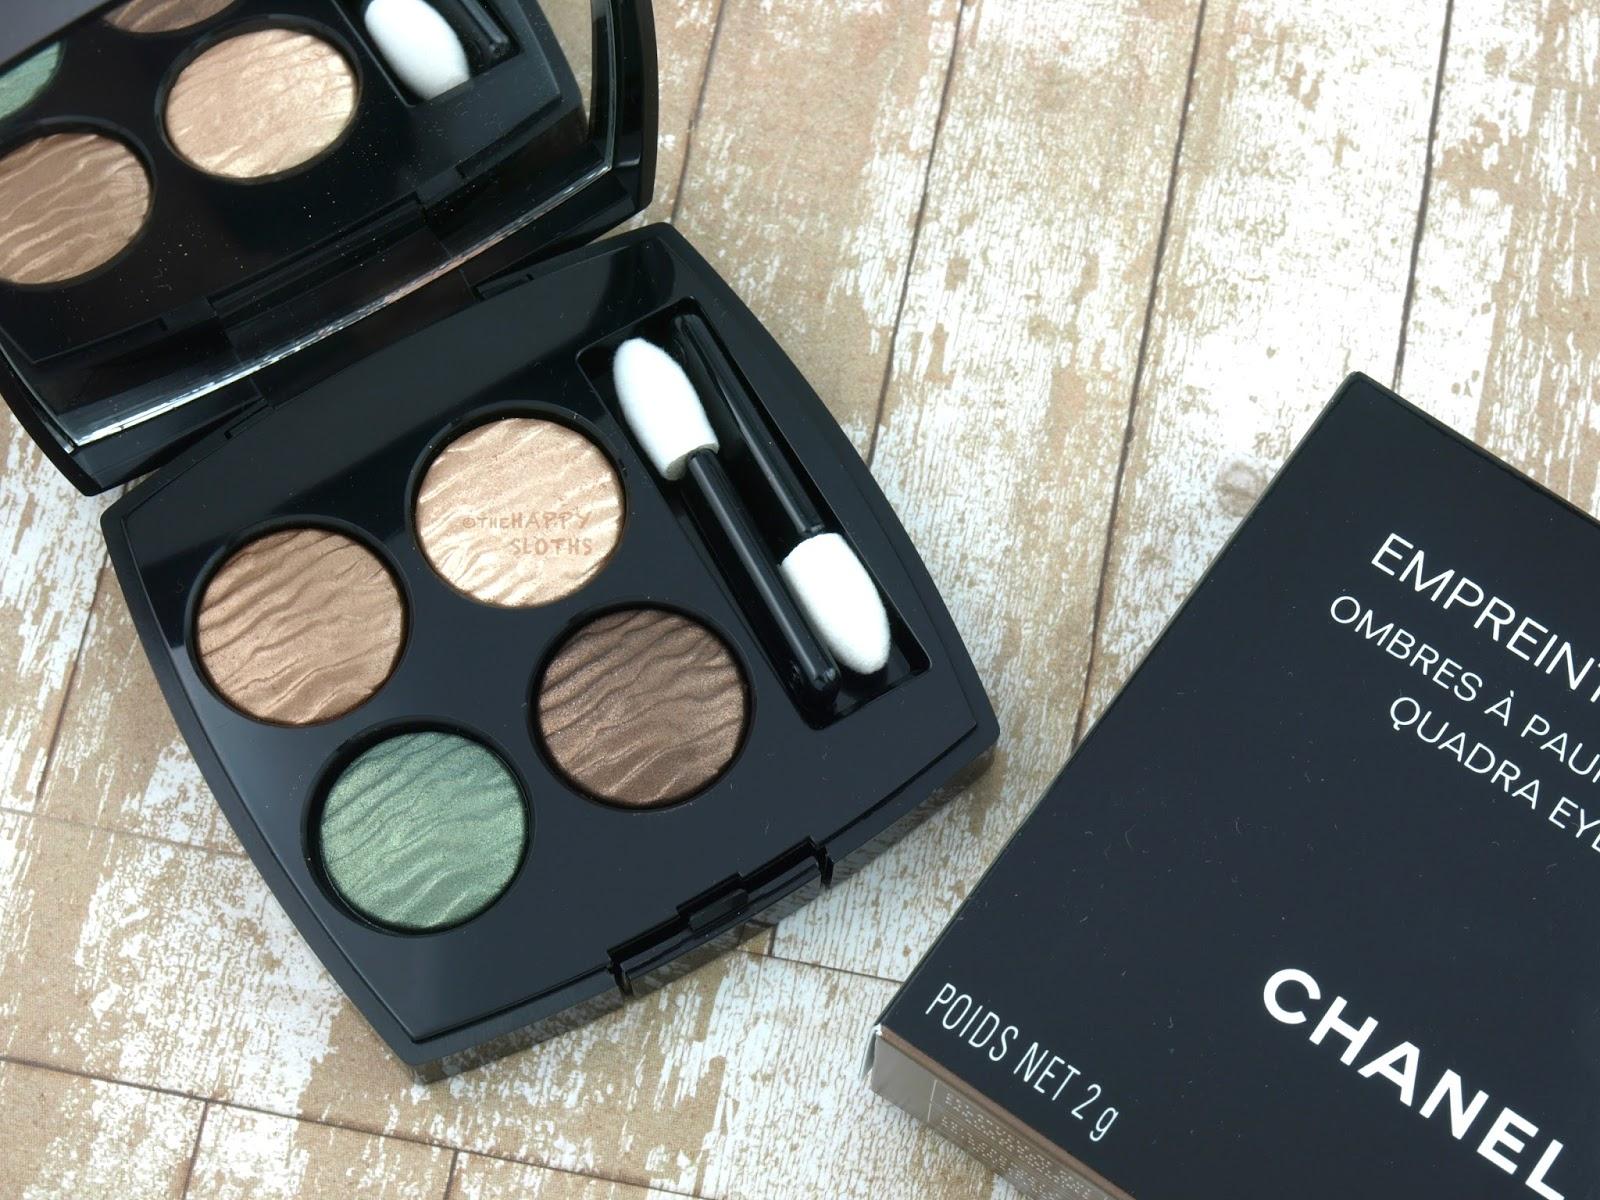 Chanel Summer 2016 Empreinte Du Deserts Eyeshadow Quad: Review And Swatches